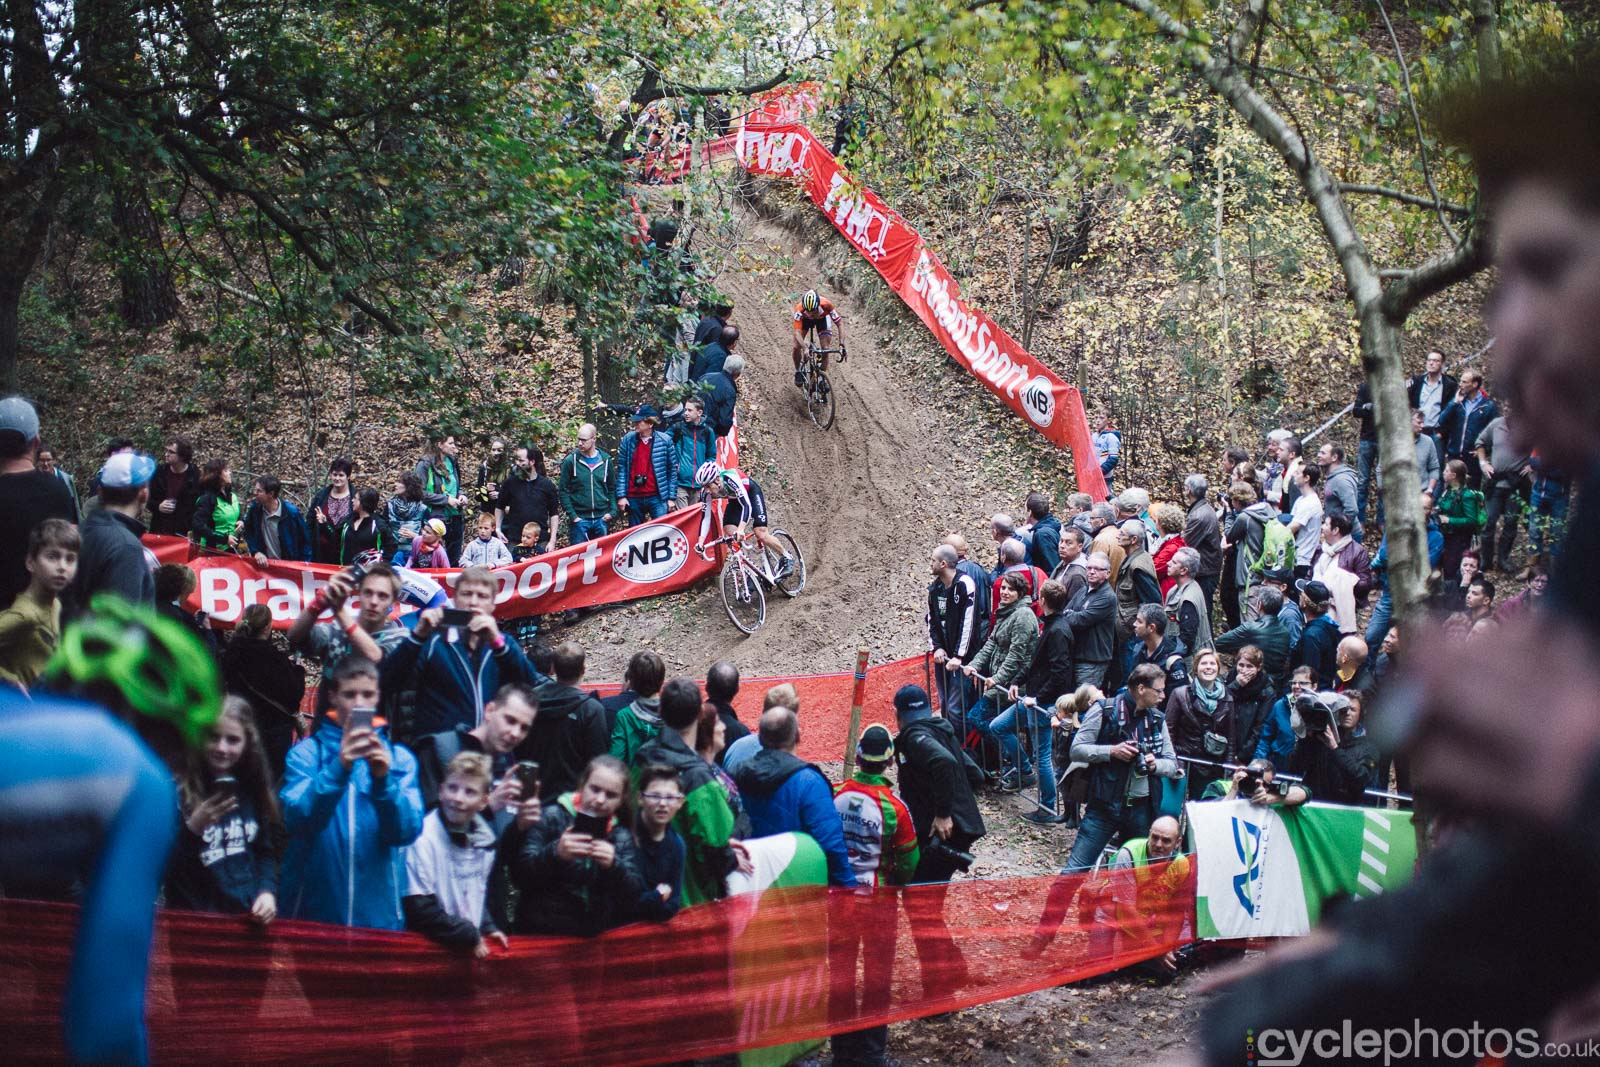 2015-cyclephotos-cyclocross-eucx-huijbergen-151706-crowds